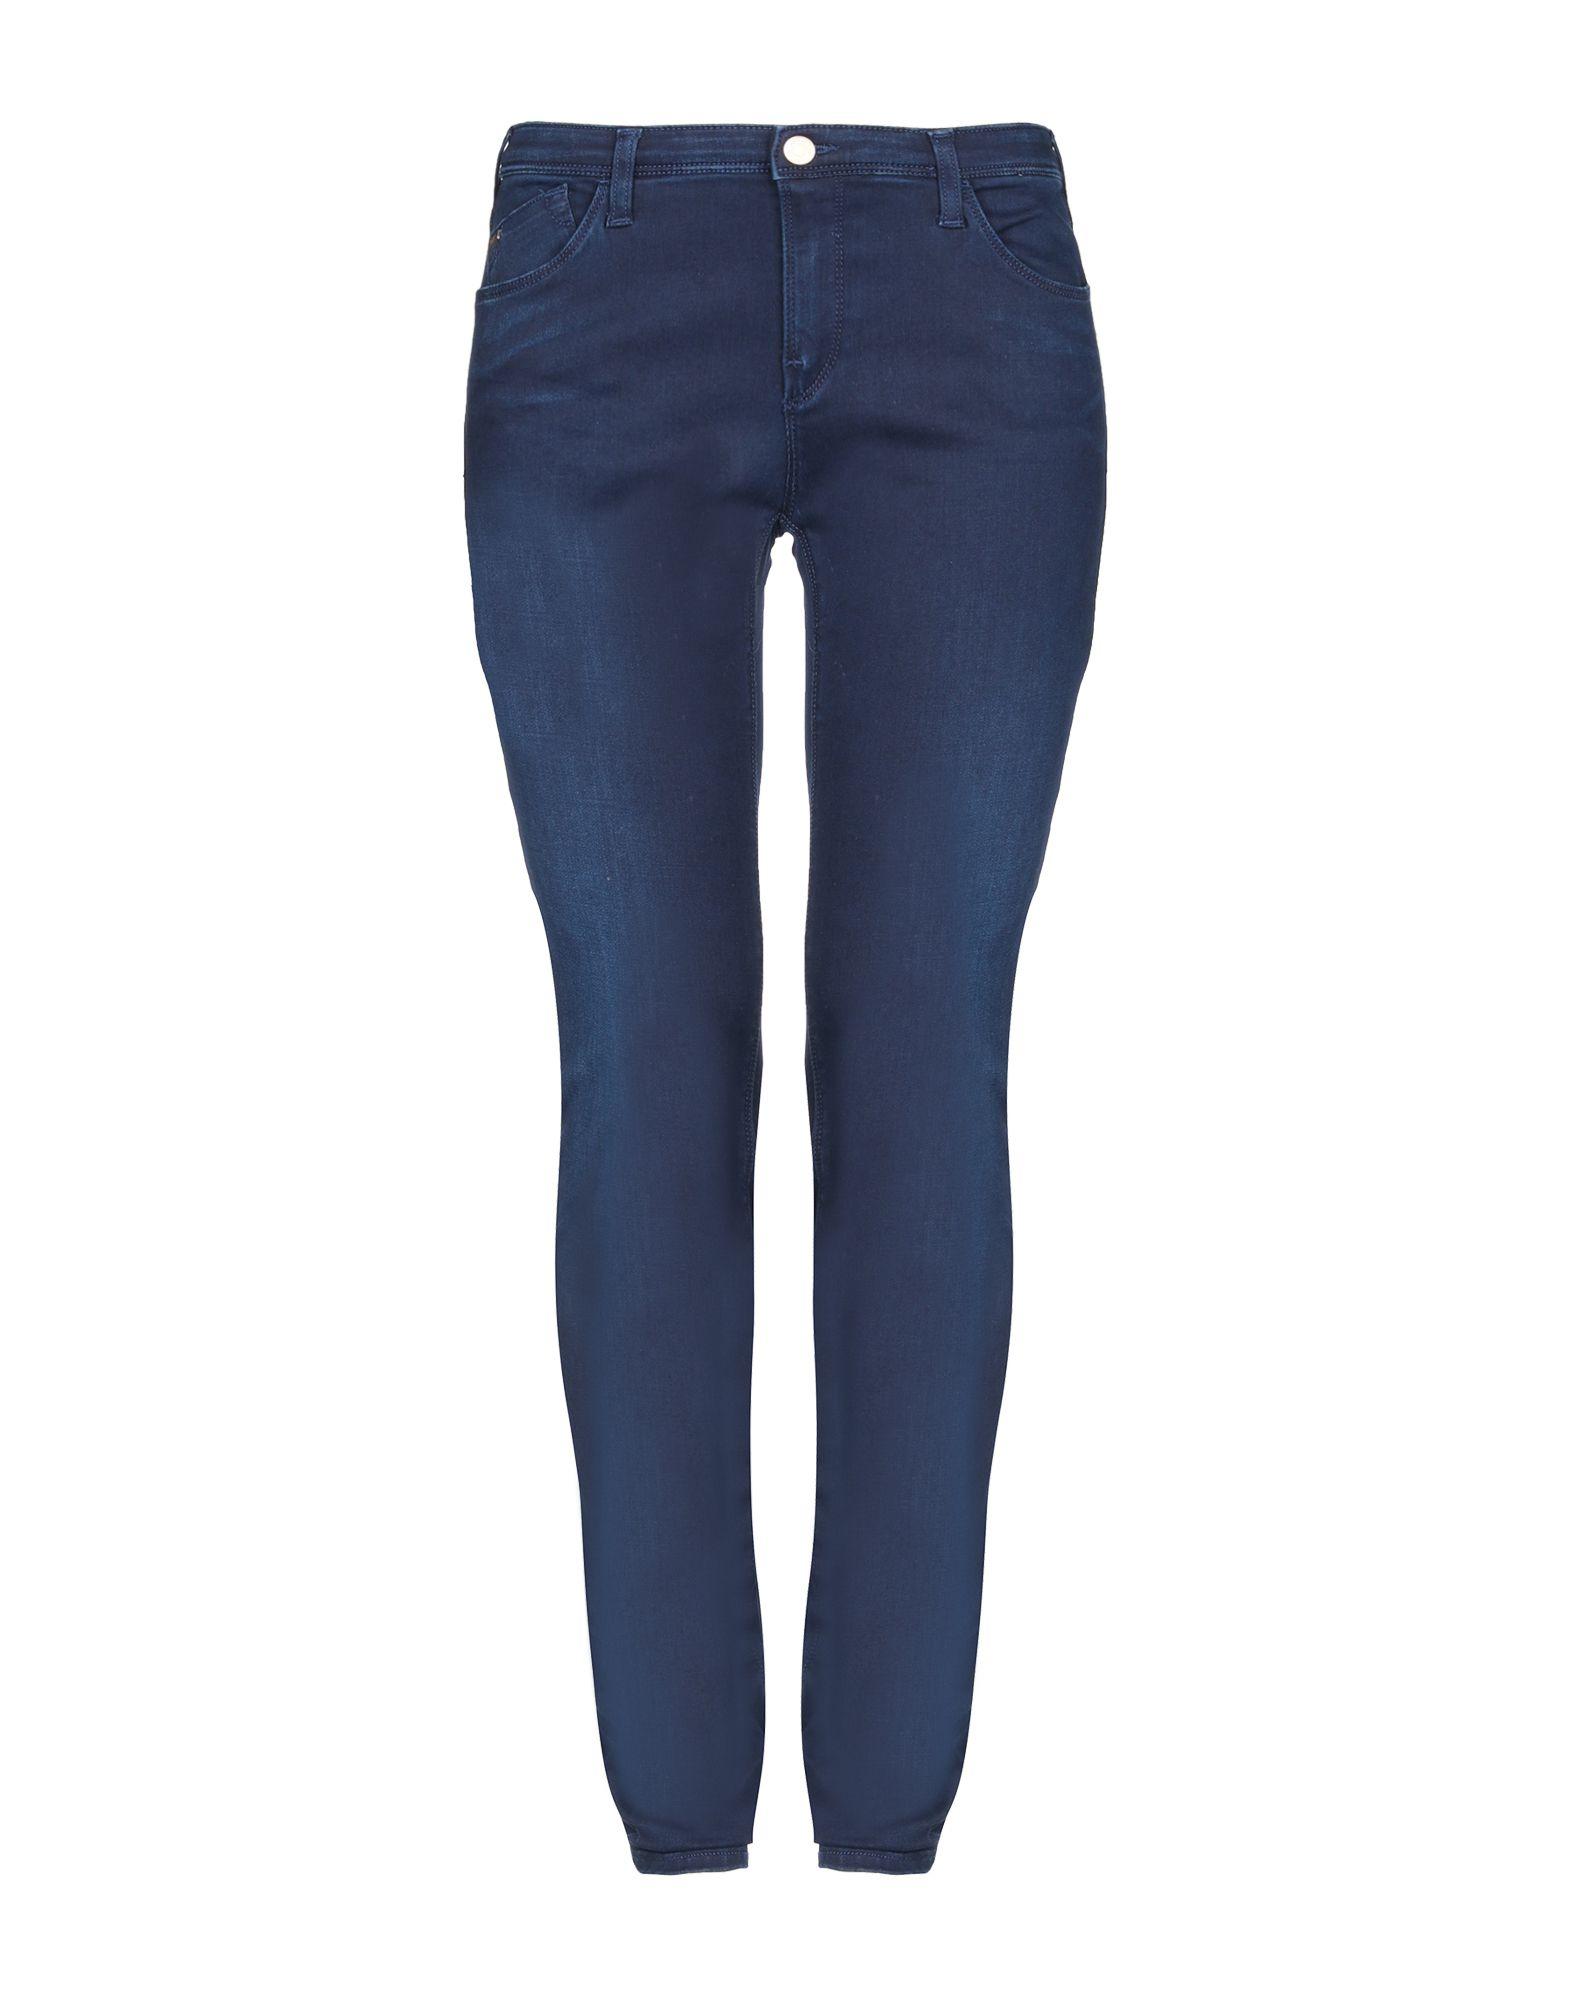 Pantaloni Jeans Jeans Armani Jeans donna - 42685513CR  bis zu 50% sparen